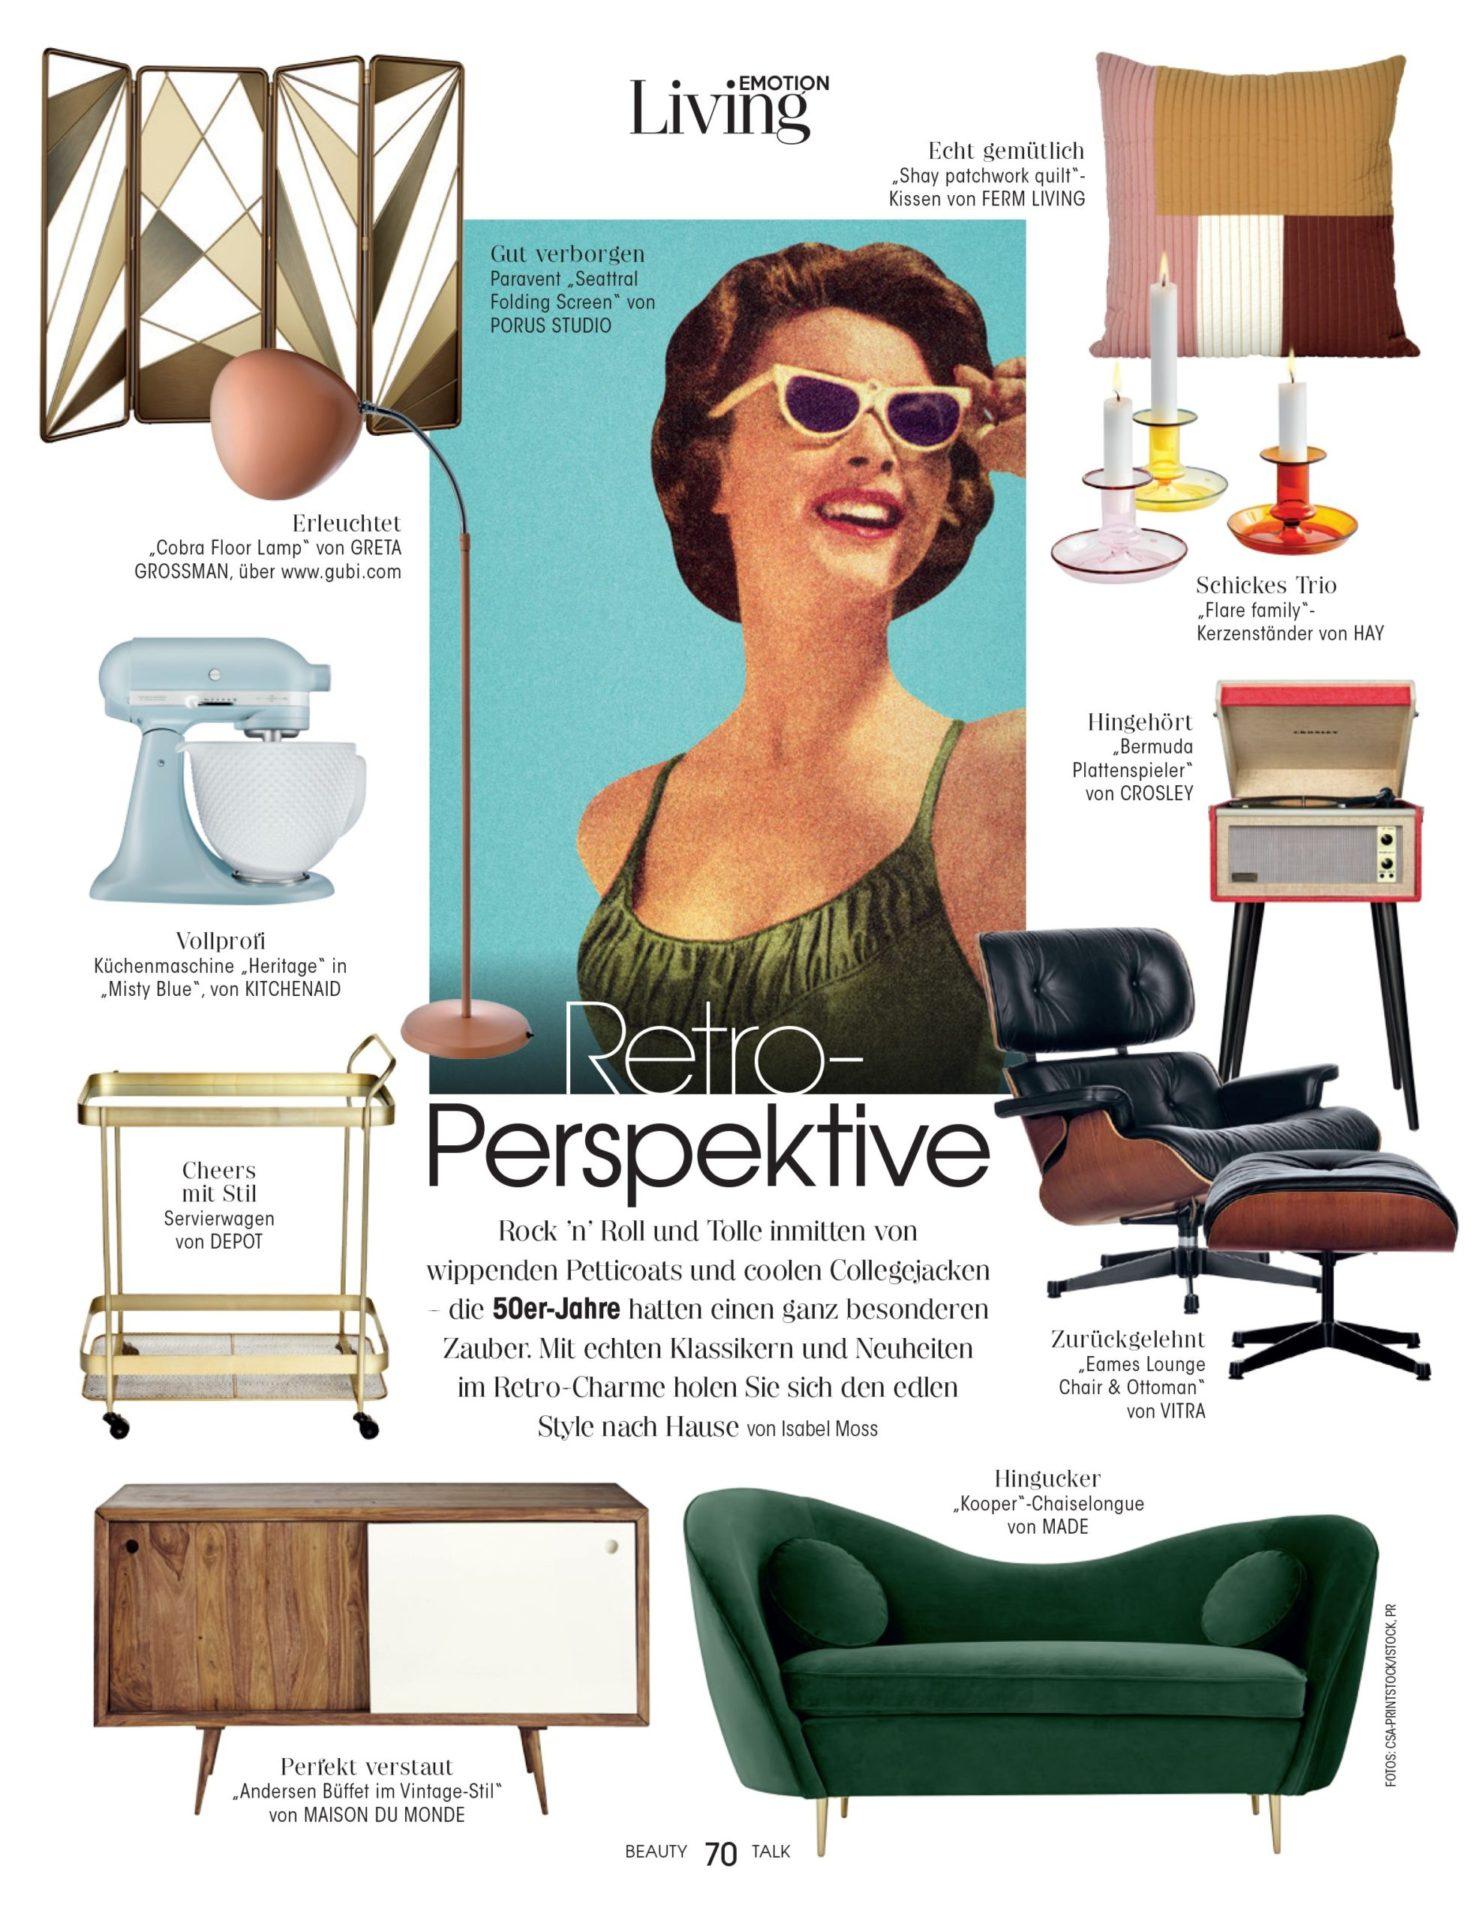 Beauty talk magazine 2019 seattral folding screen